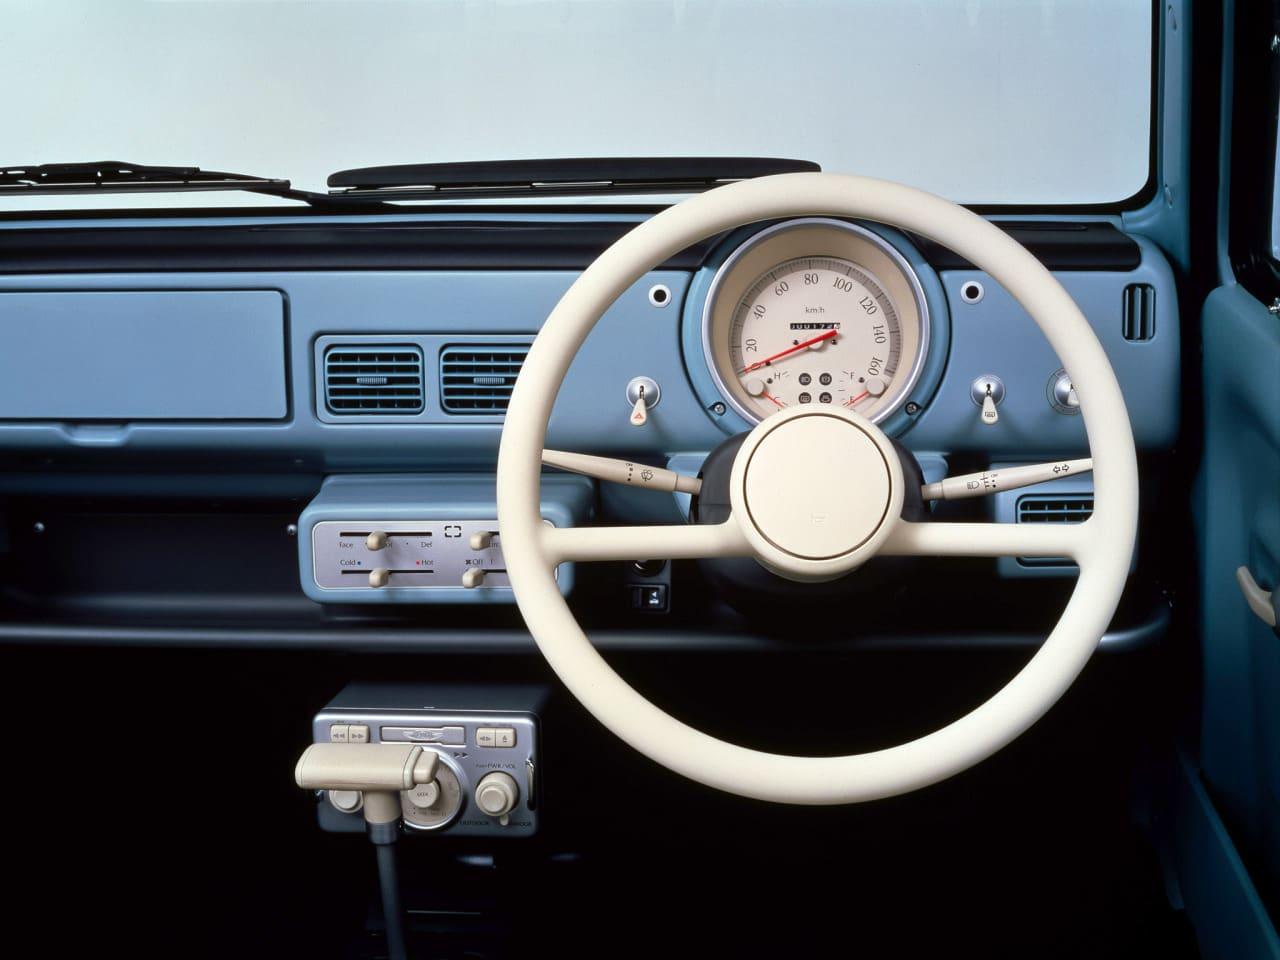 Nissan Pao interior